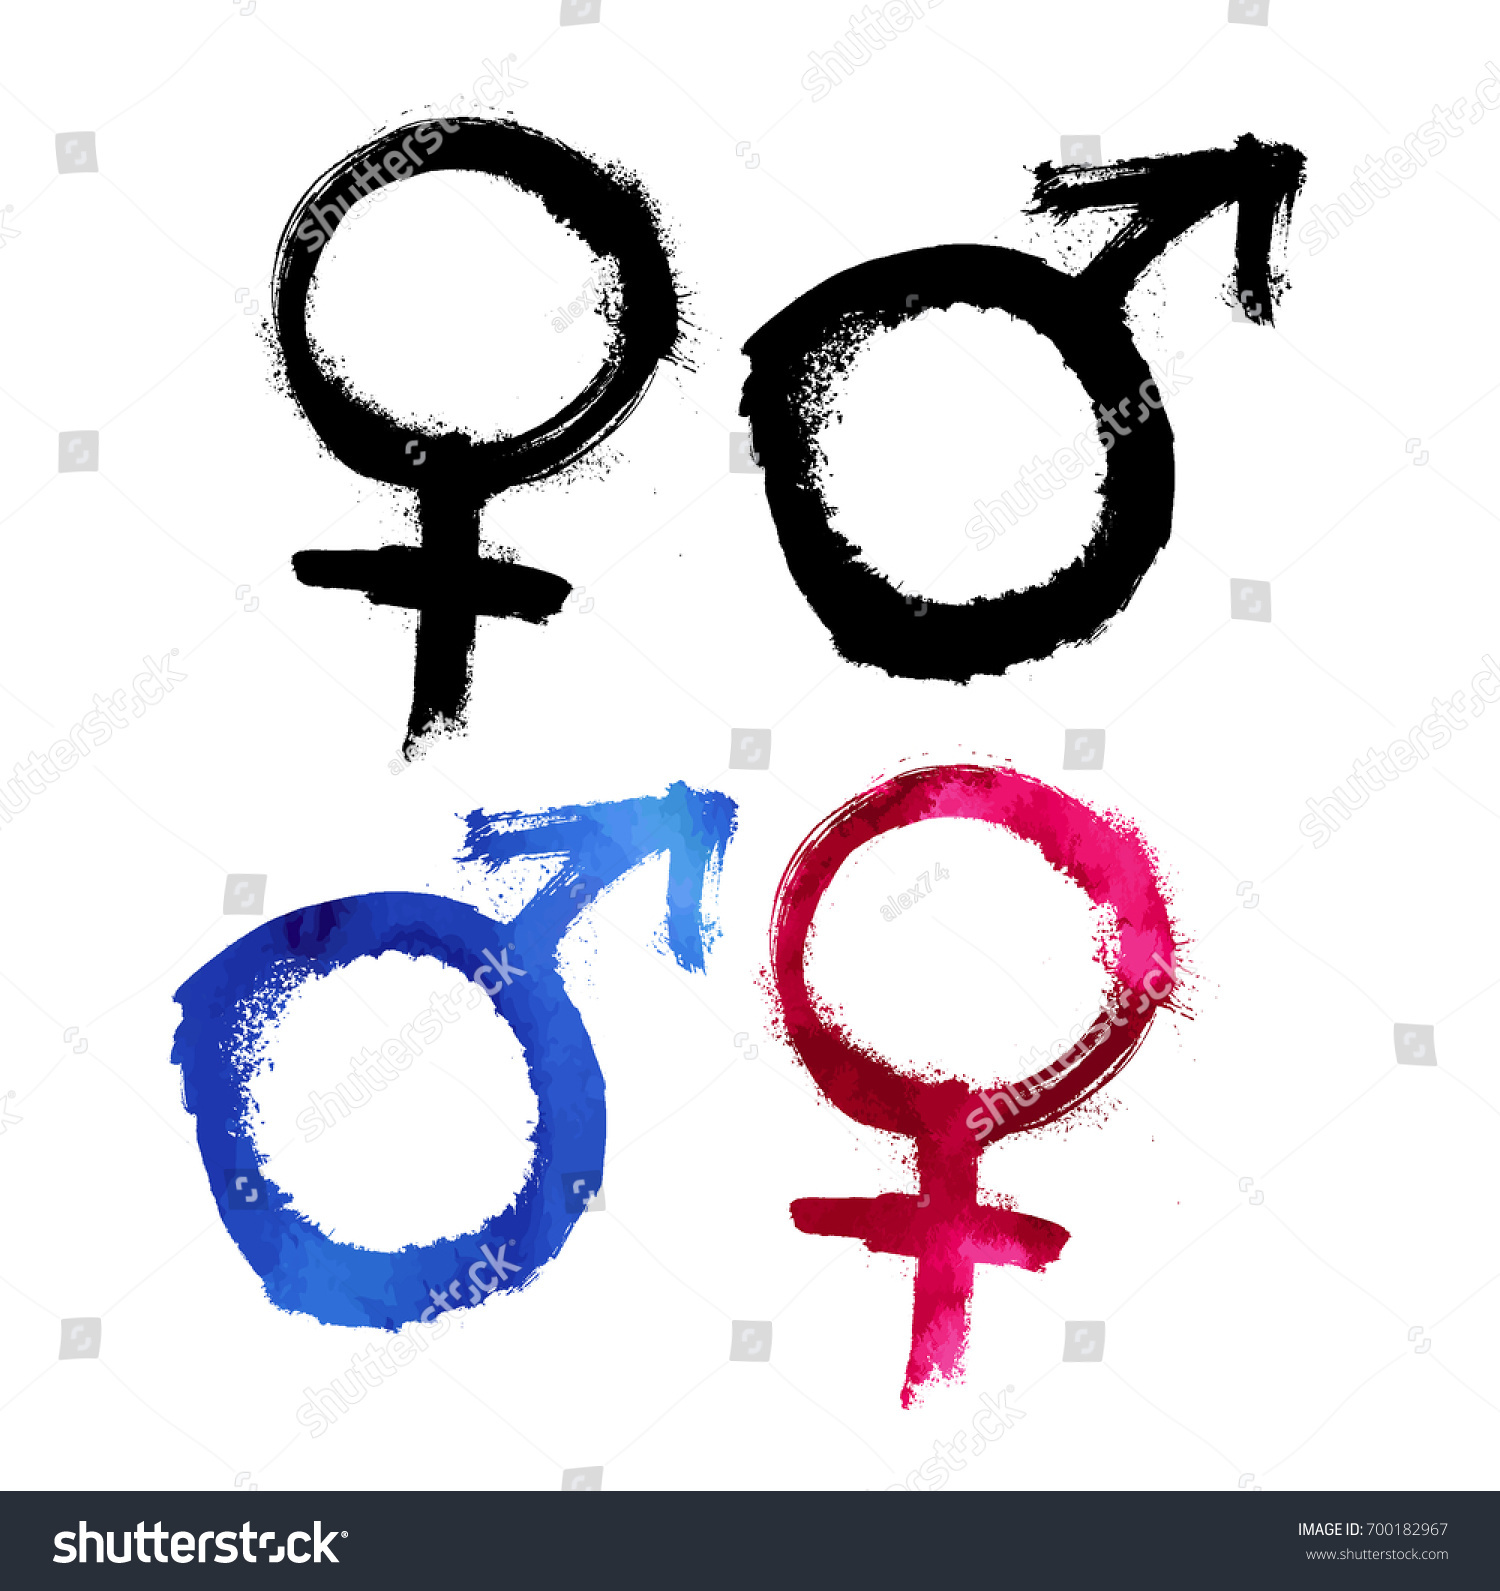 Grunge Gender Symbols Vector Design Element Stock Photo Photo